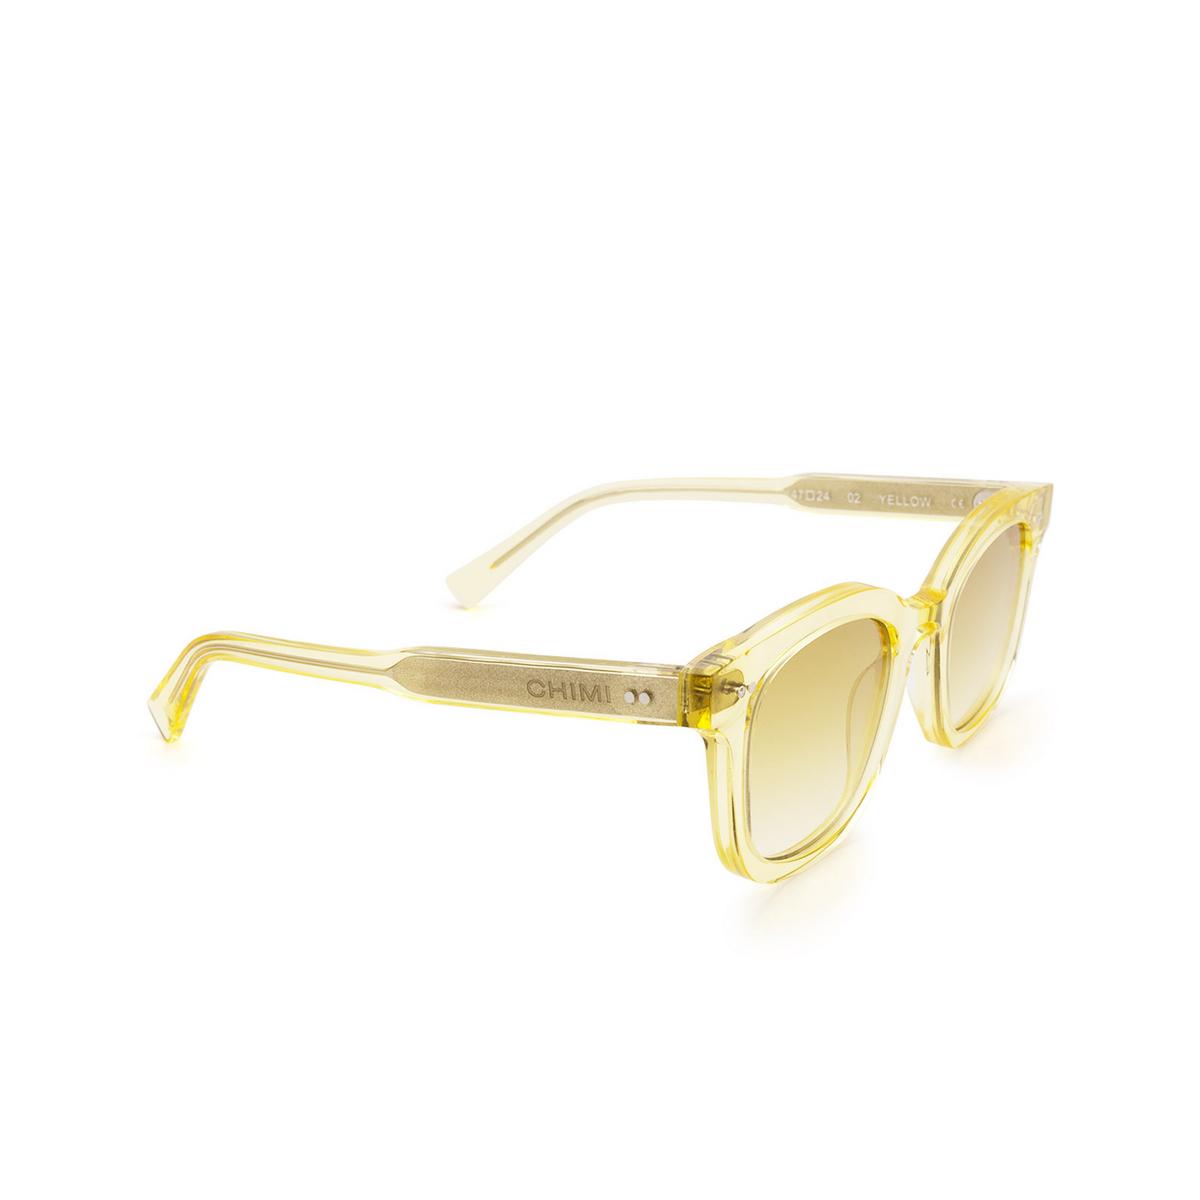 Chimi® Square Sunglasses: 02 color Yellow - three-quarters view.